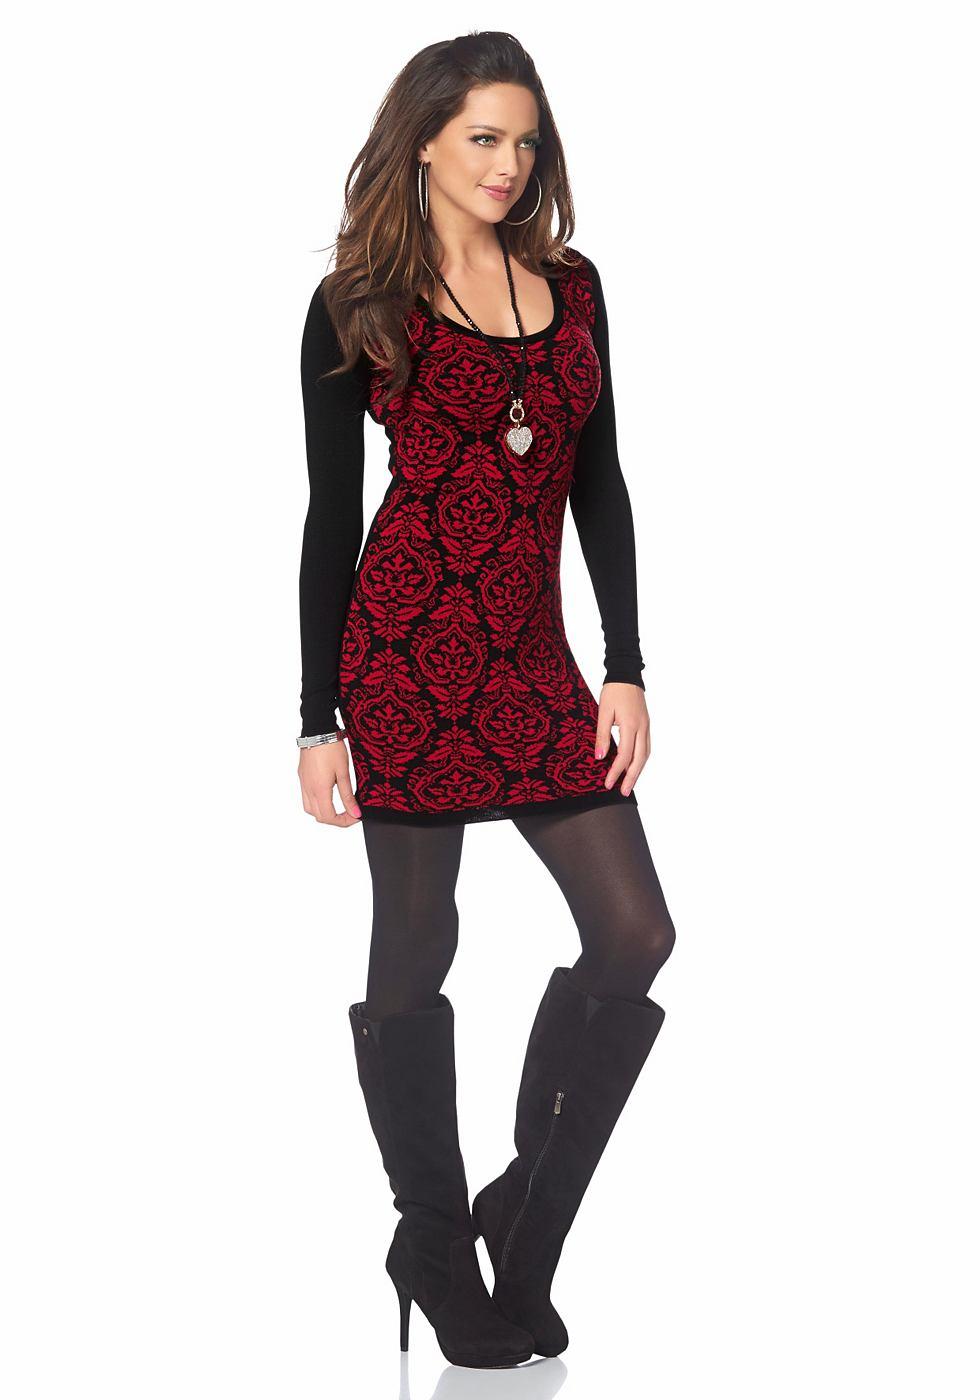 Melrose Tricot-jurk met motief voor rood